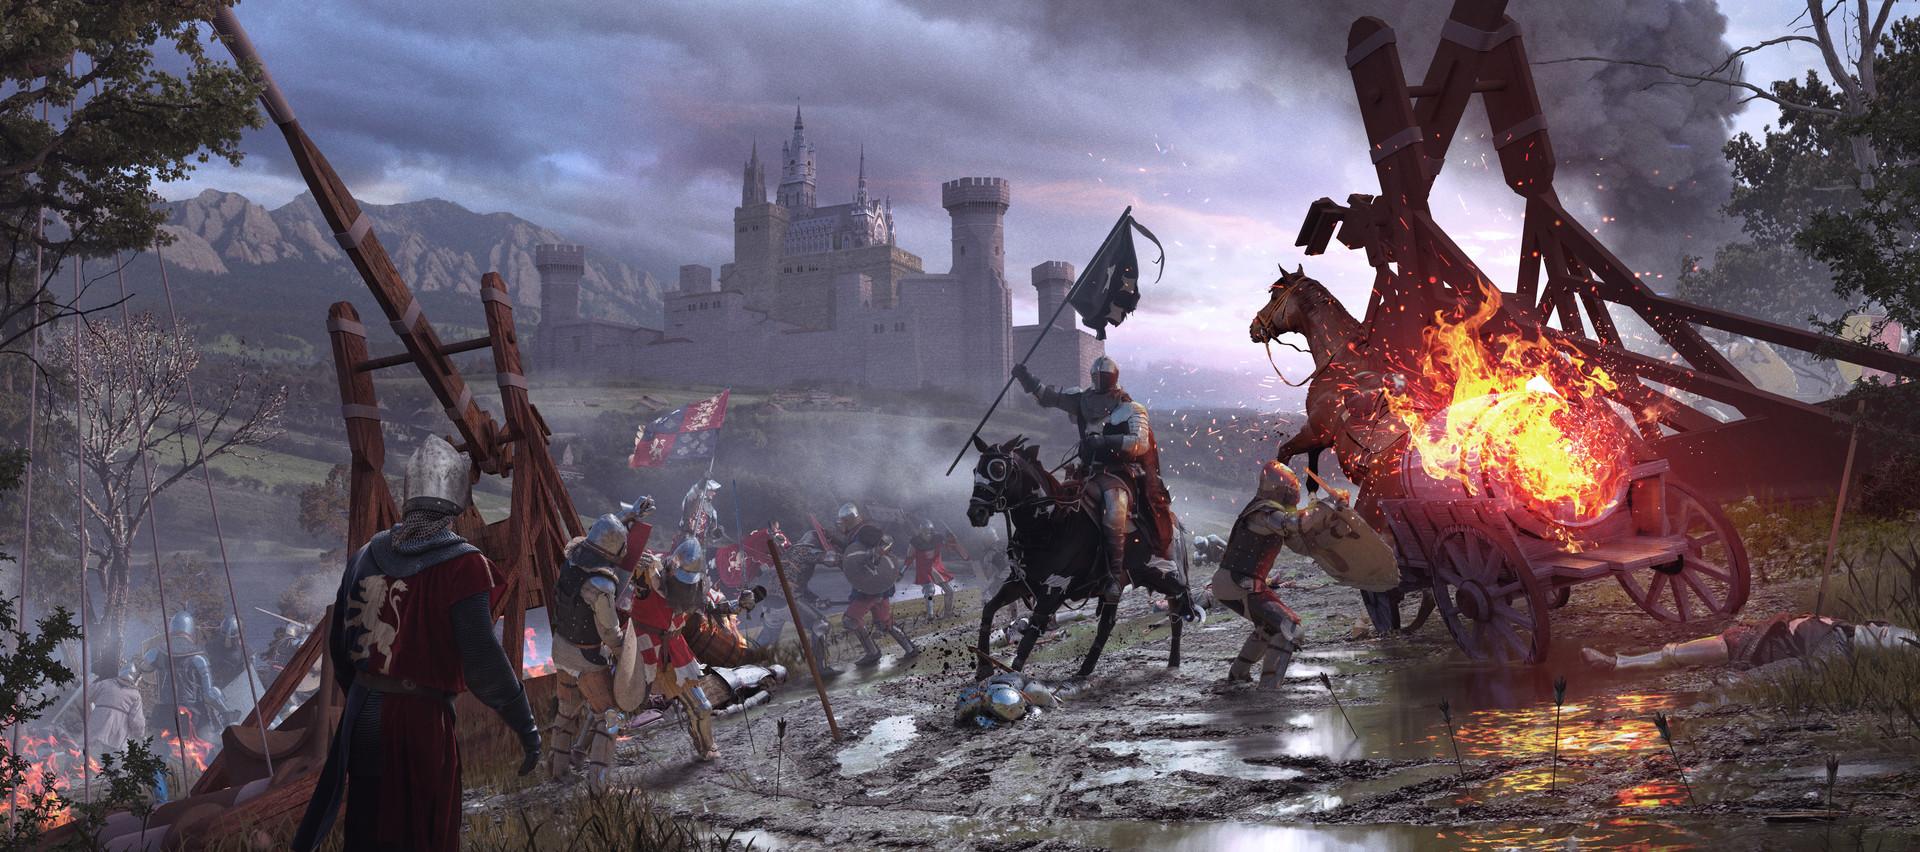 alfven-ato-siege.jpg?1530770221